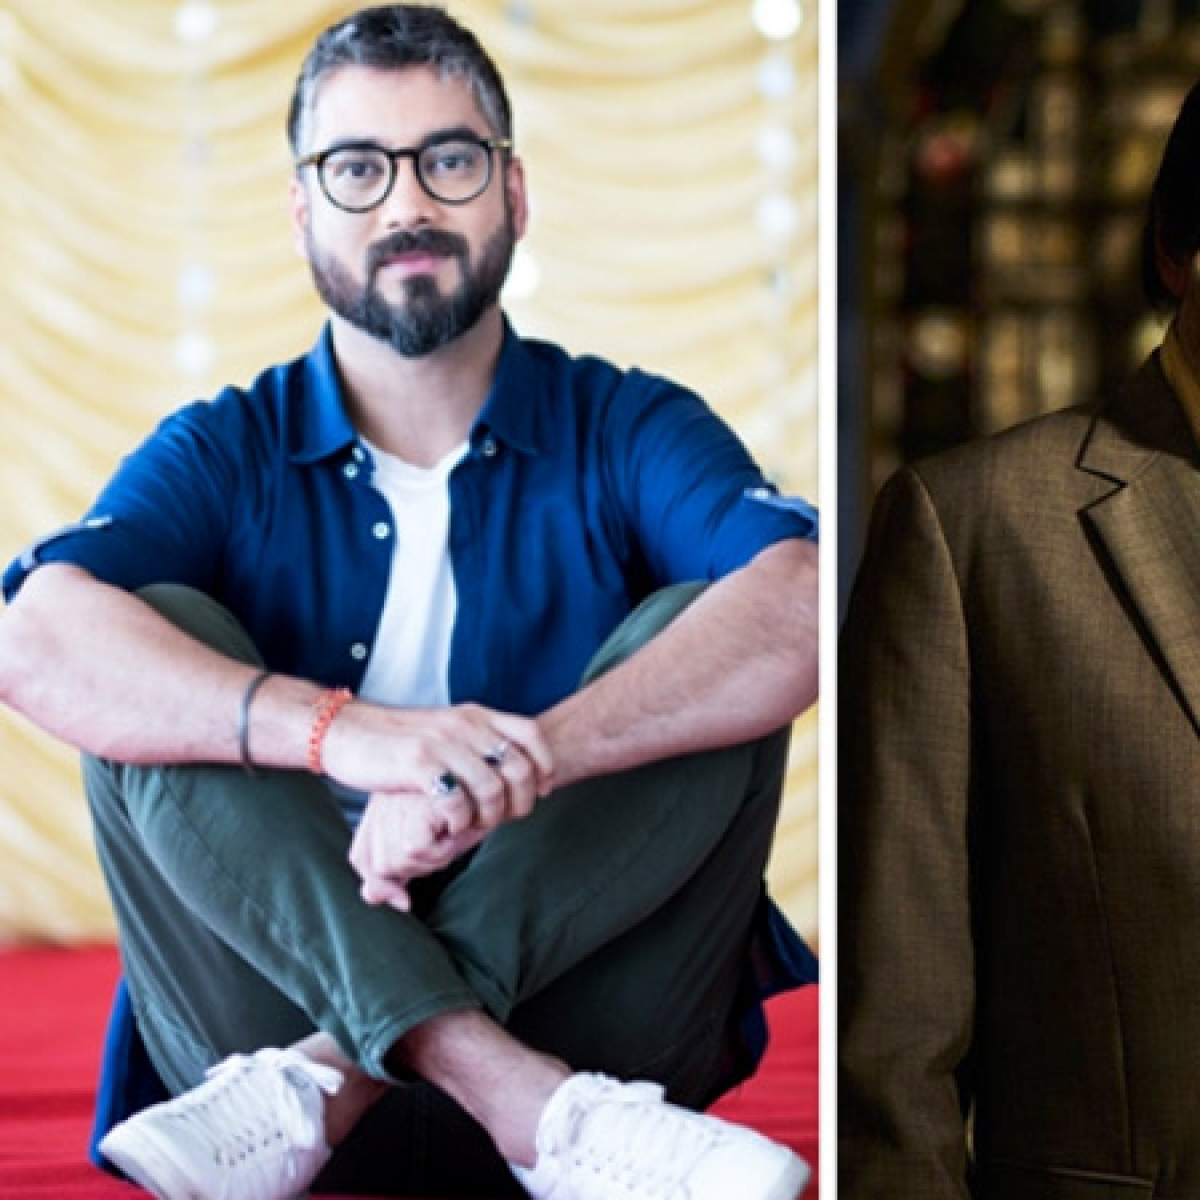 Director Amit Sharma considers  Amitabh Bachchan's letter 'no less than an award'